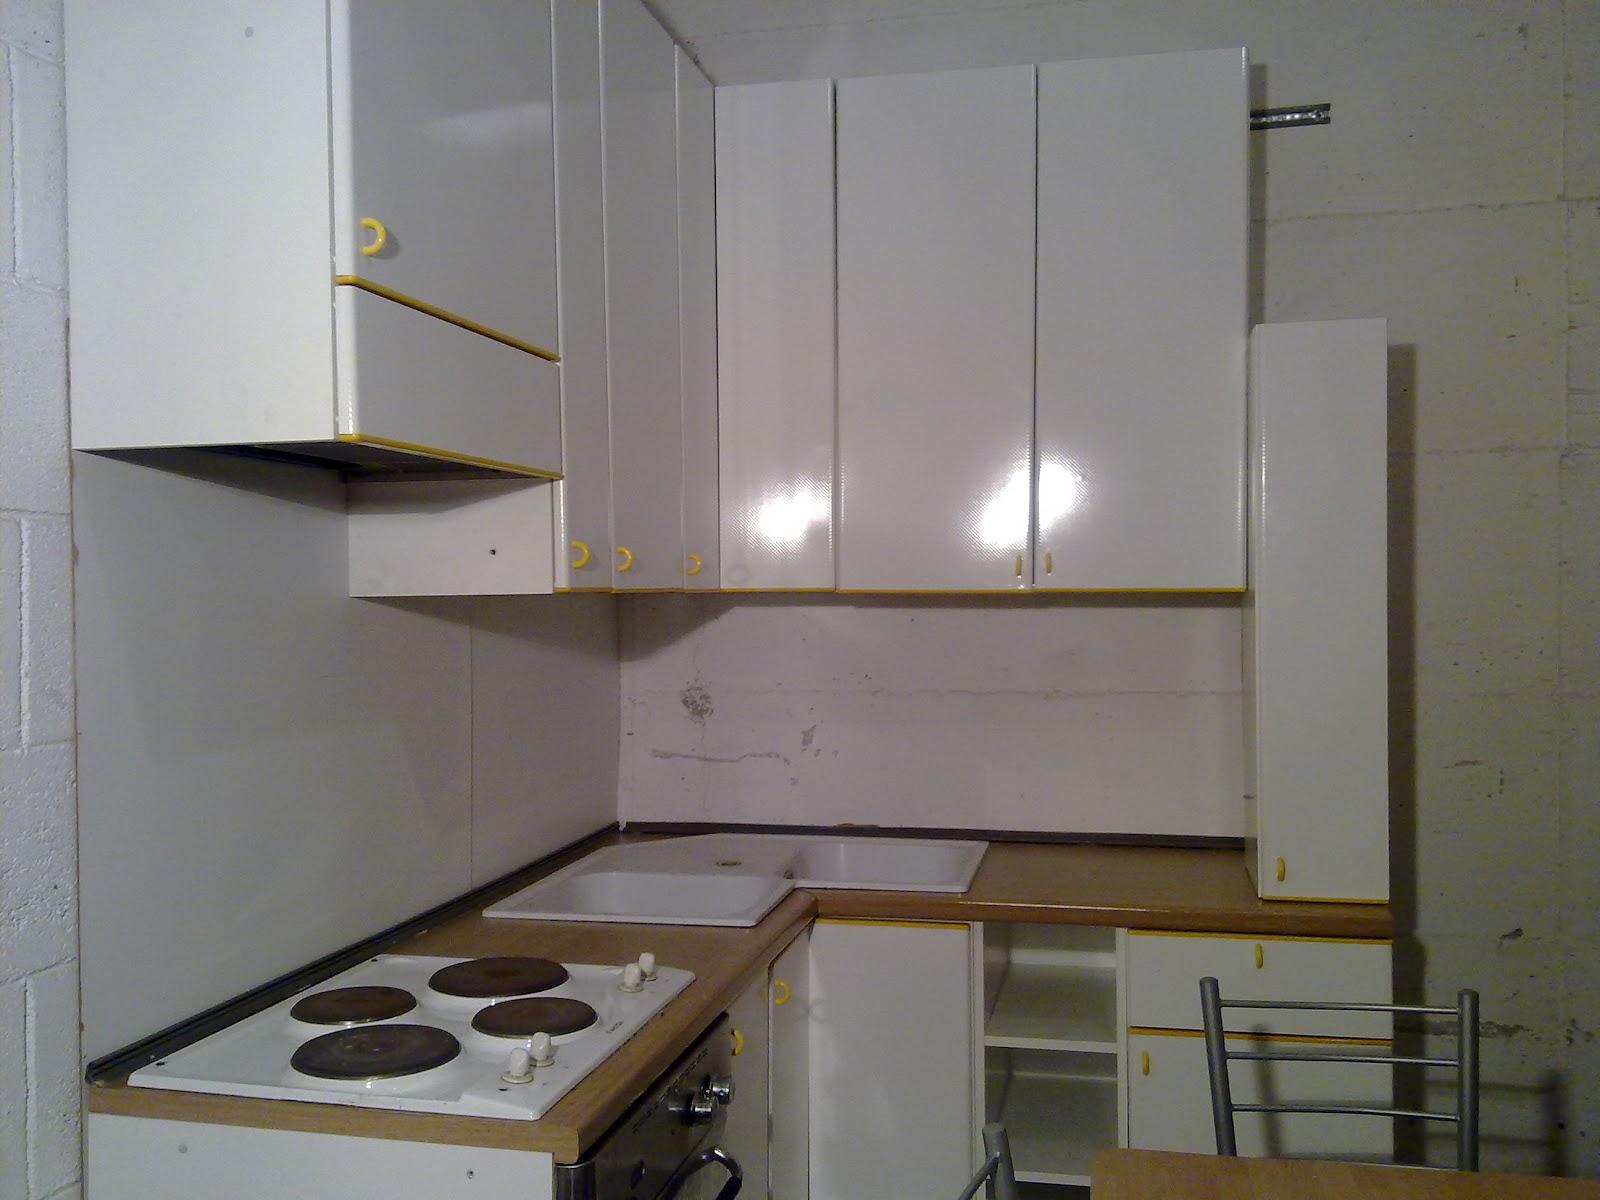 Arredamento usato a roma for Arredamento cucina usato